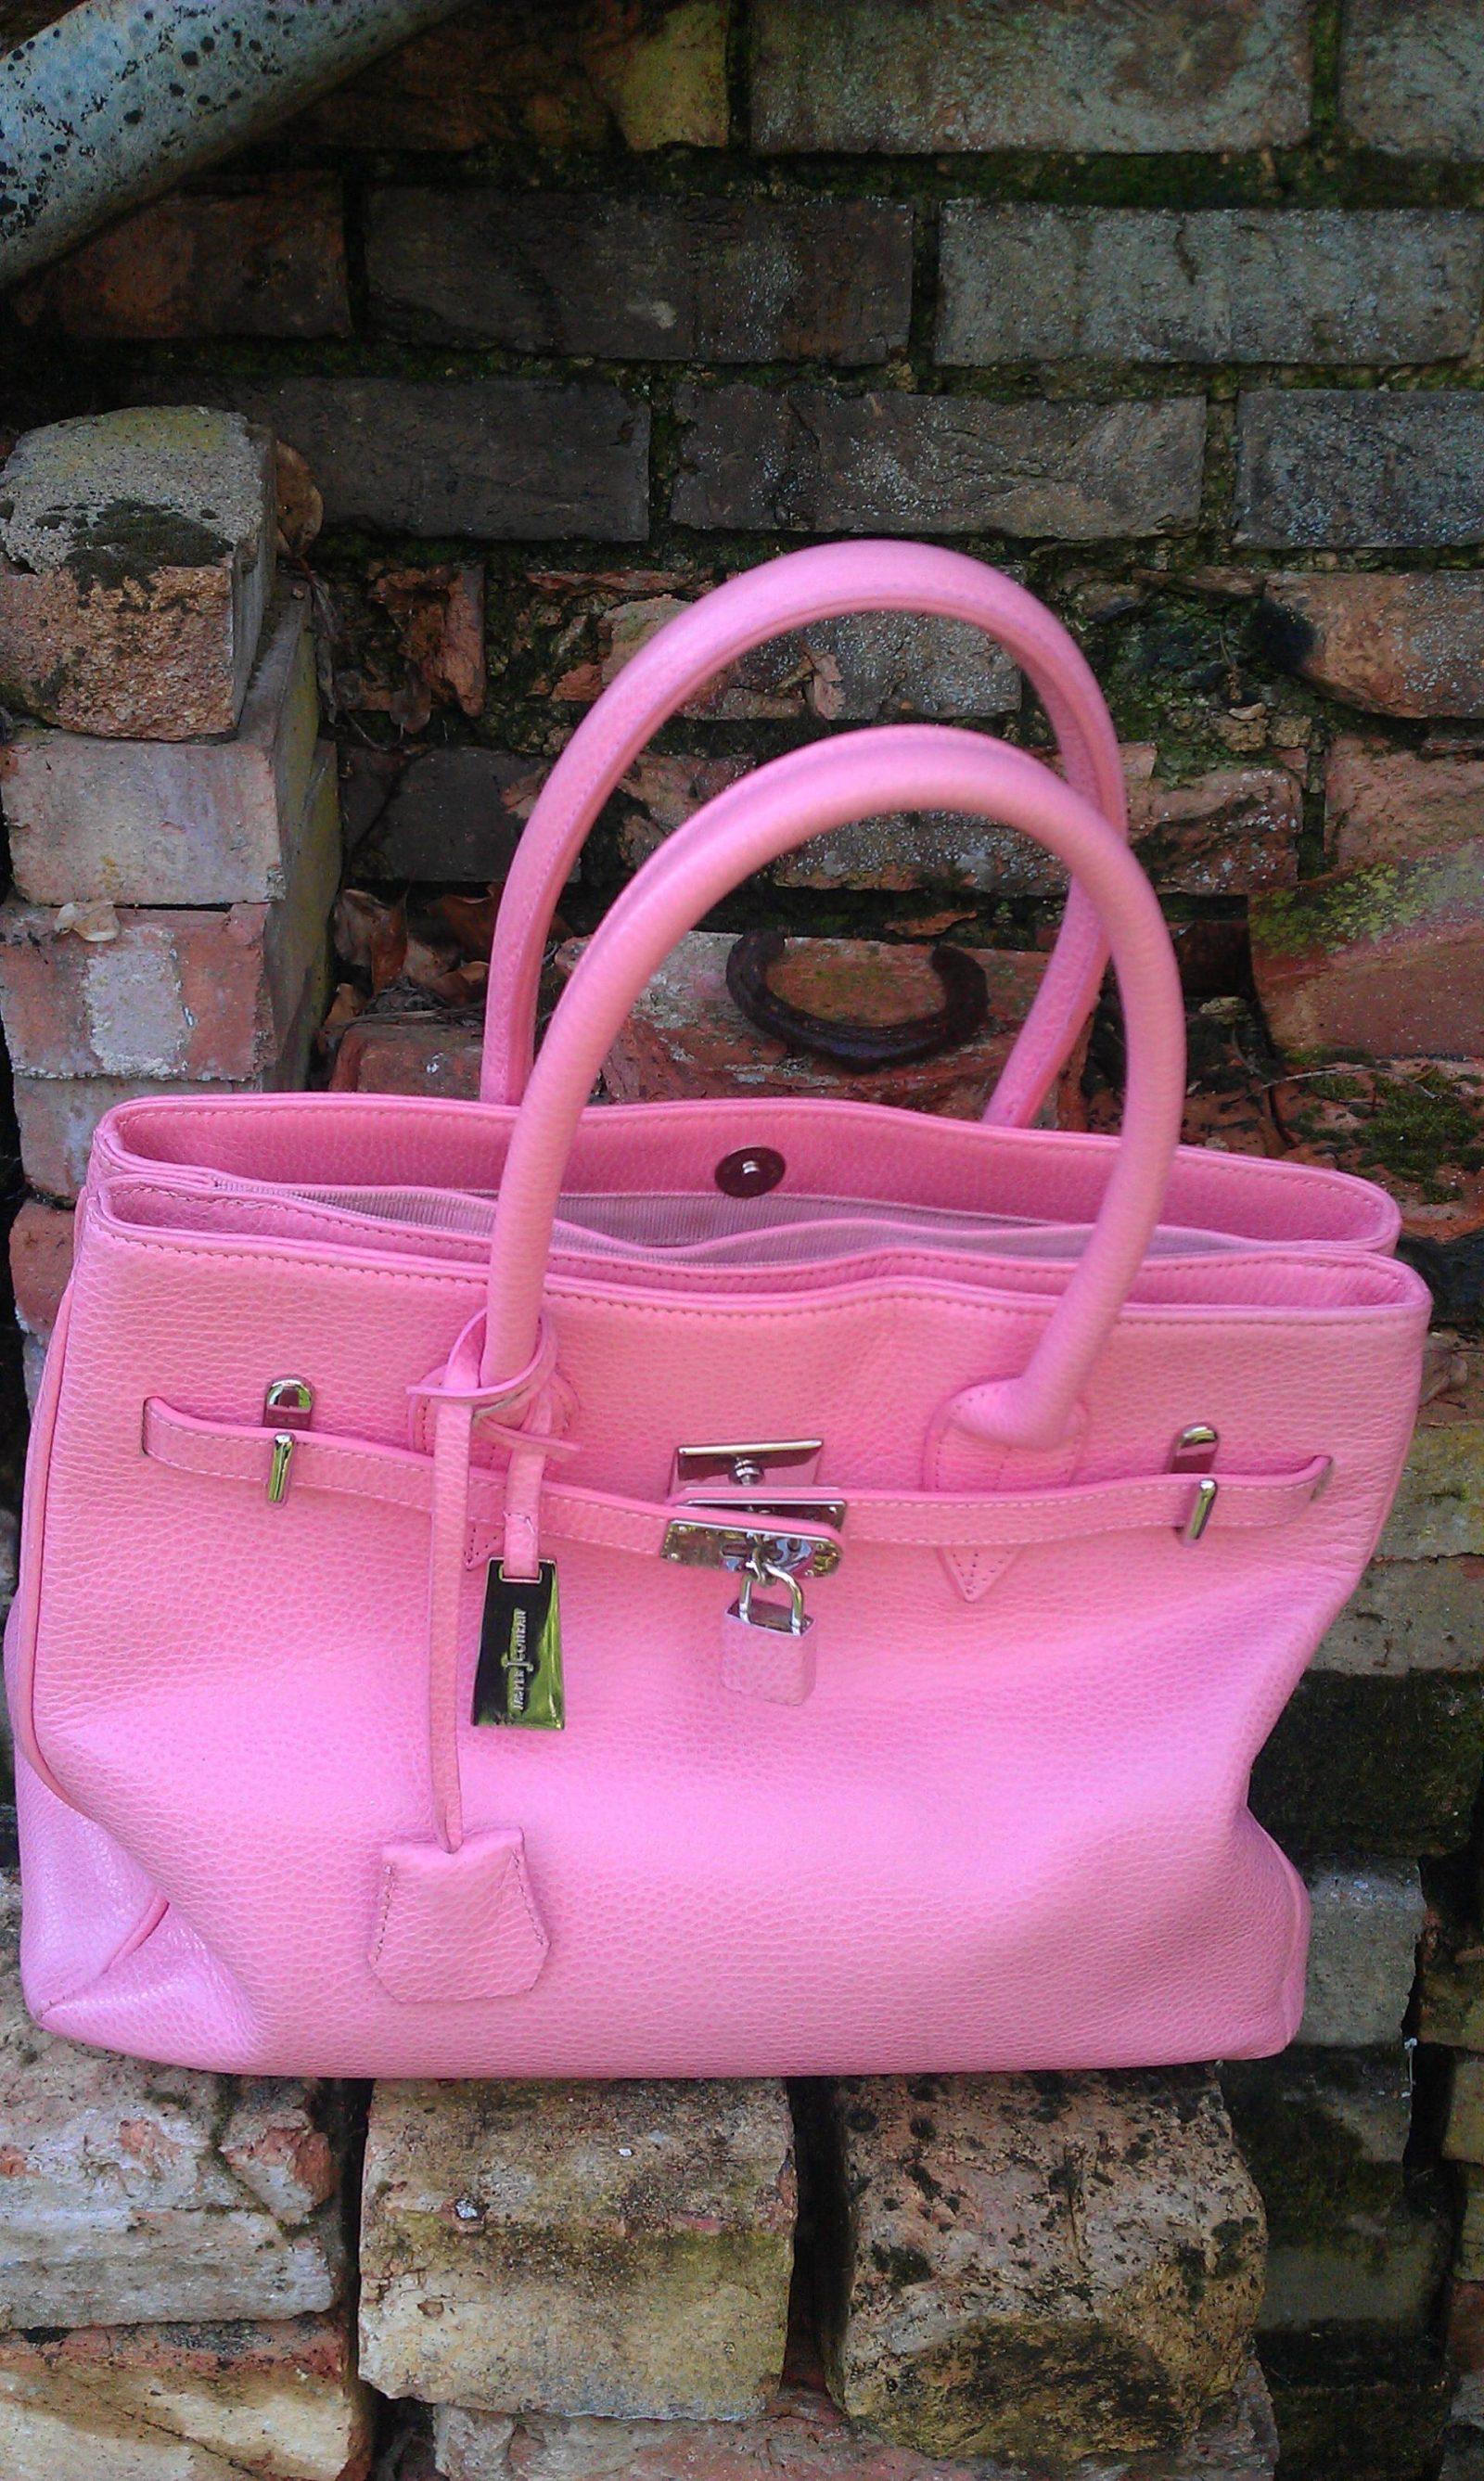 J by Jasper Conran pink tote bag